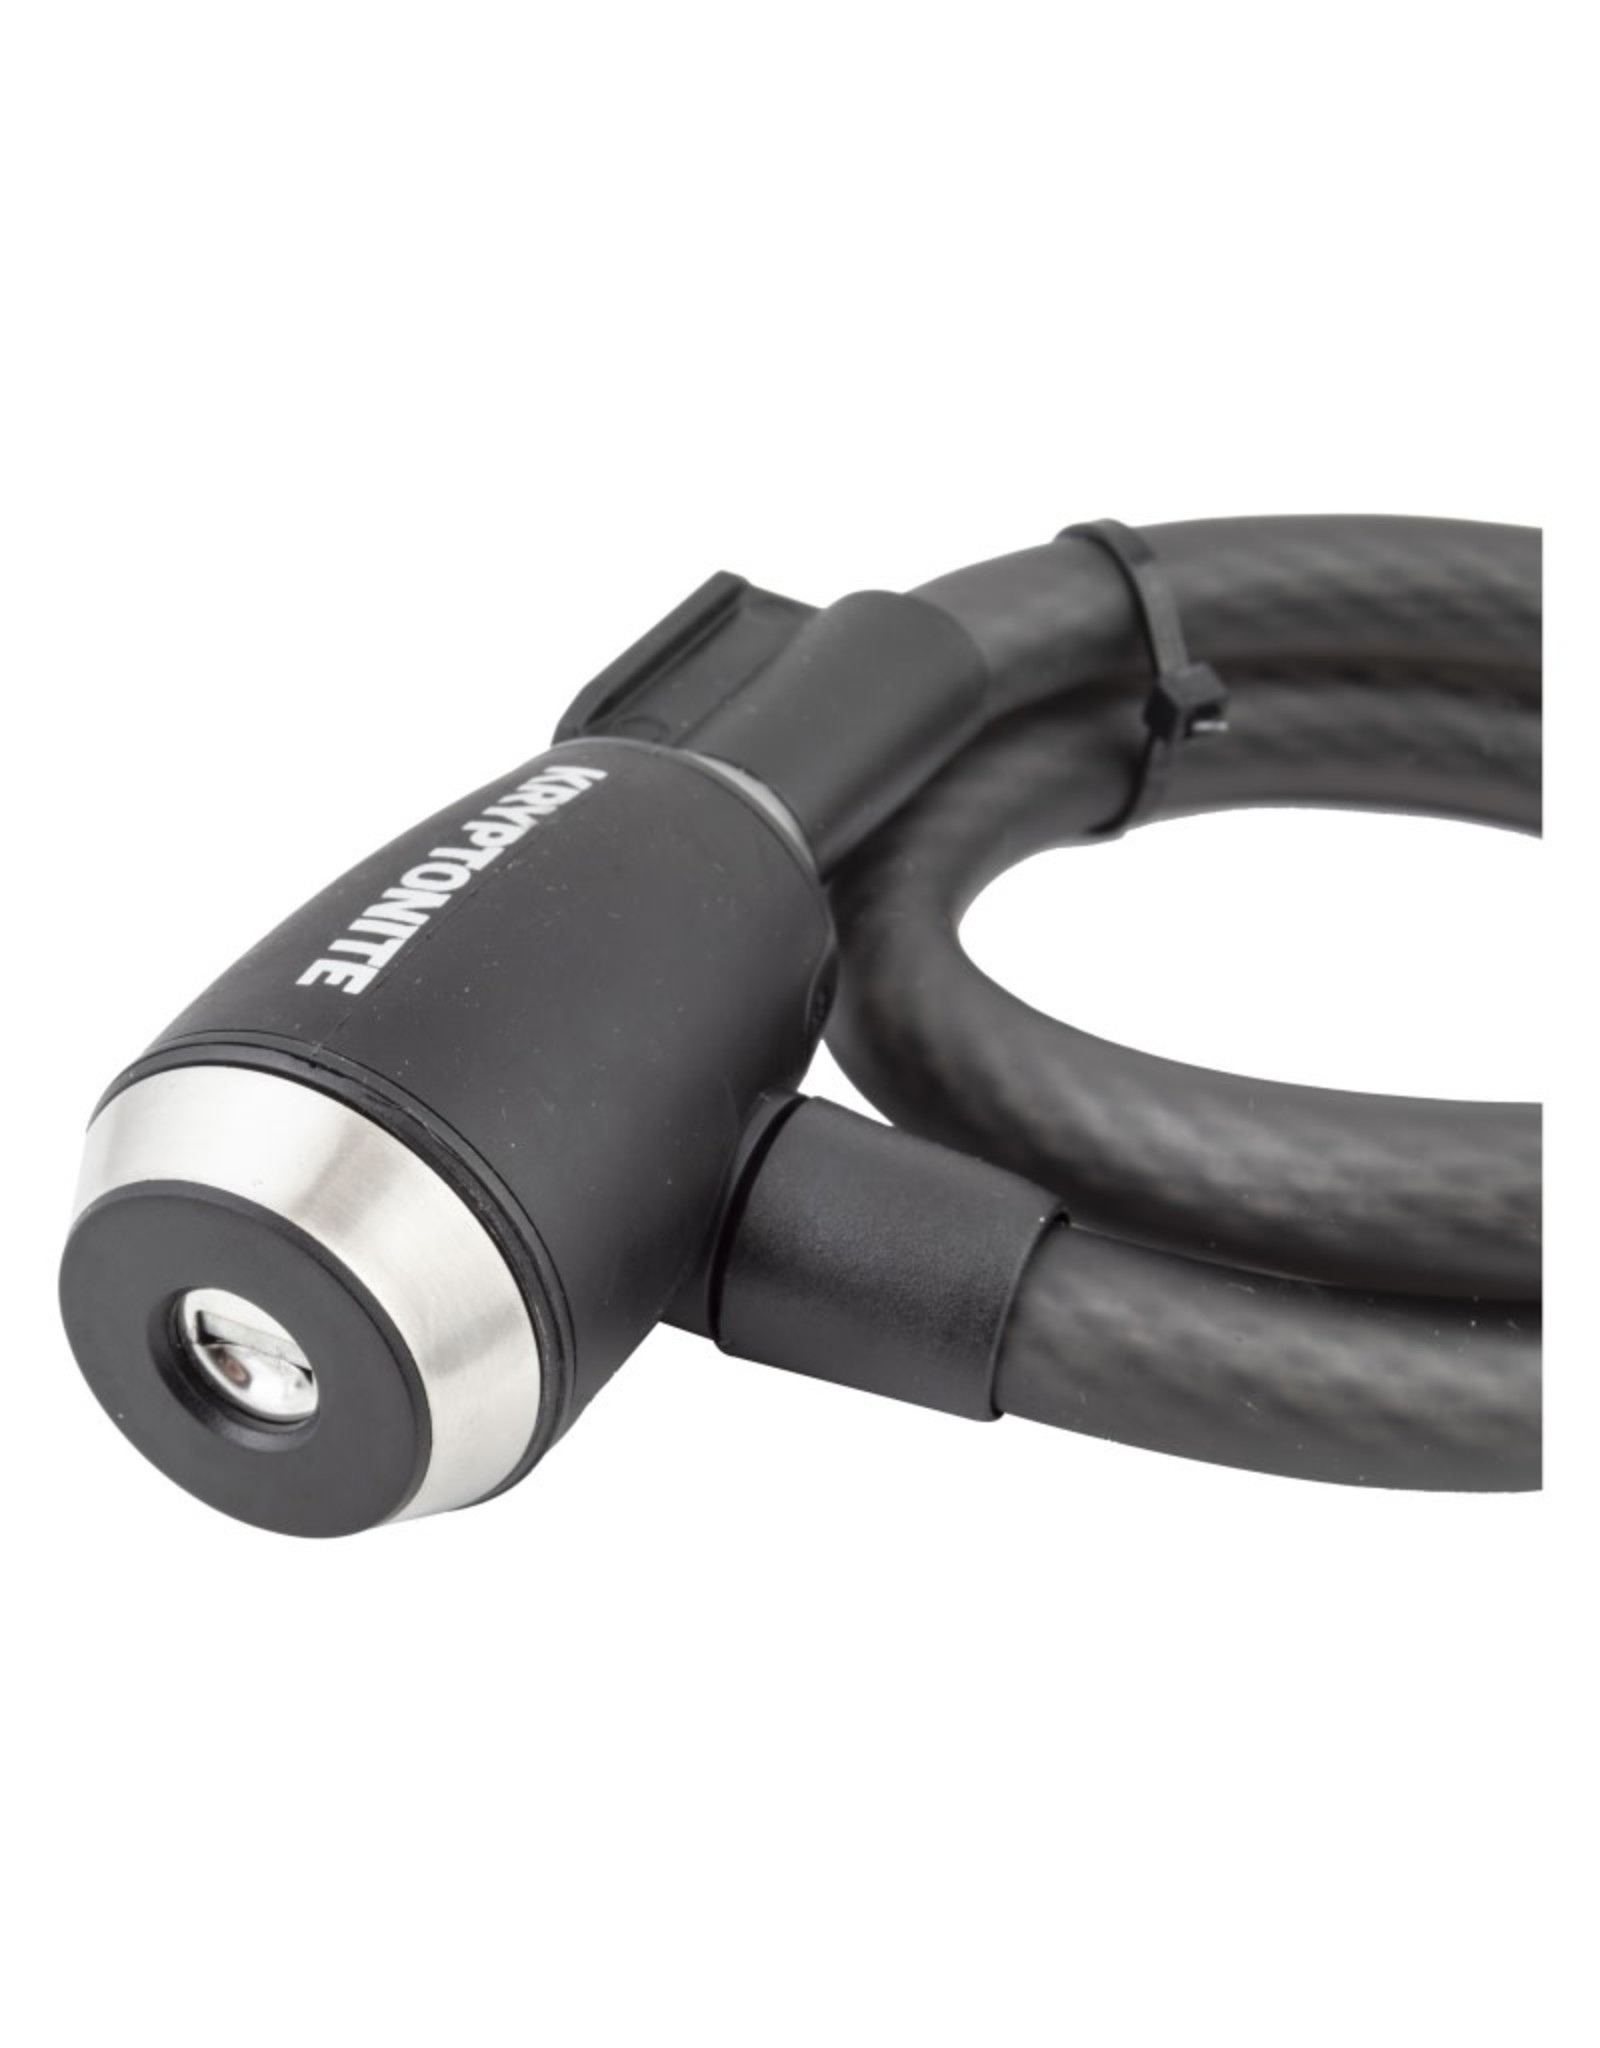 KRYPTONITE KryptoFlex 1565 Key Cable Lock 2.125fx15mm w/BKT BK